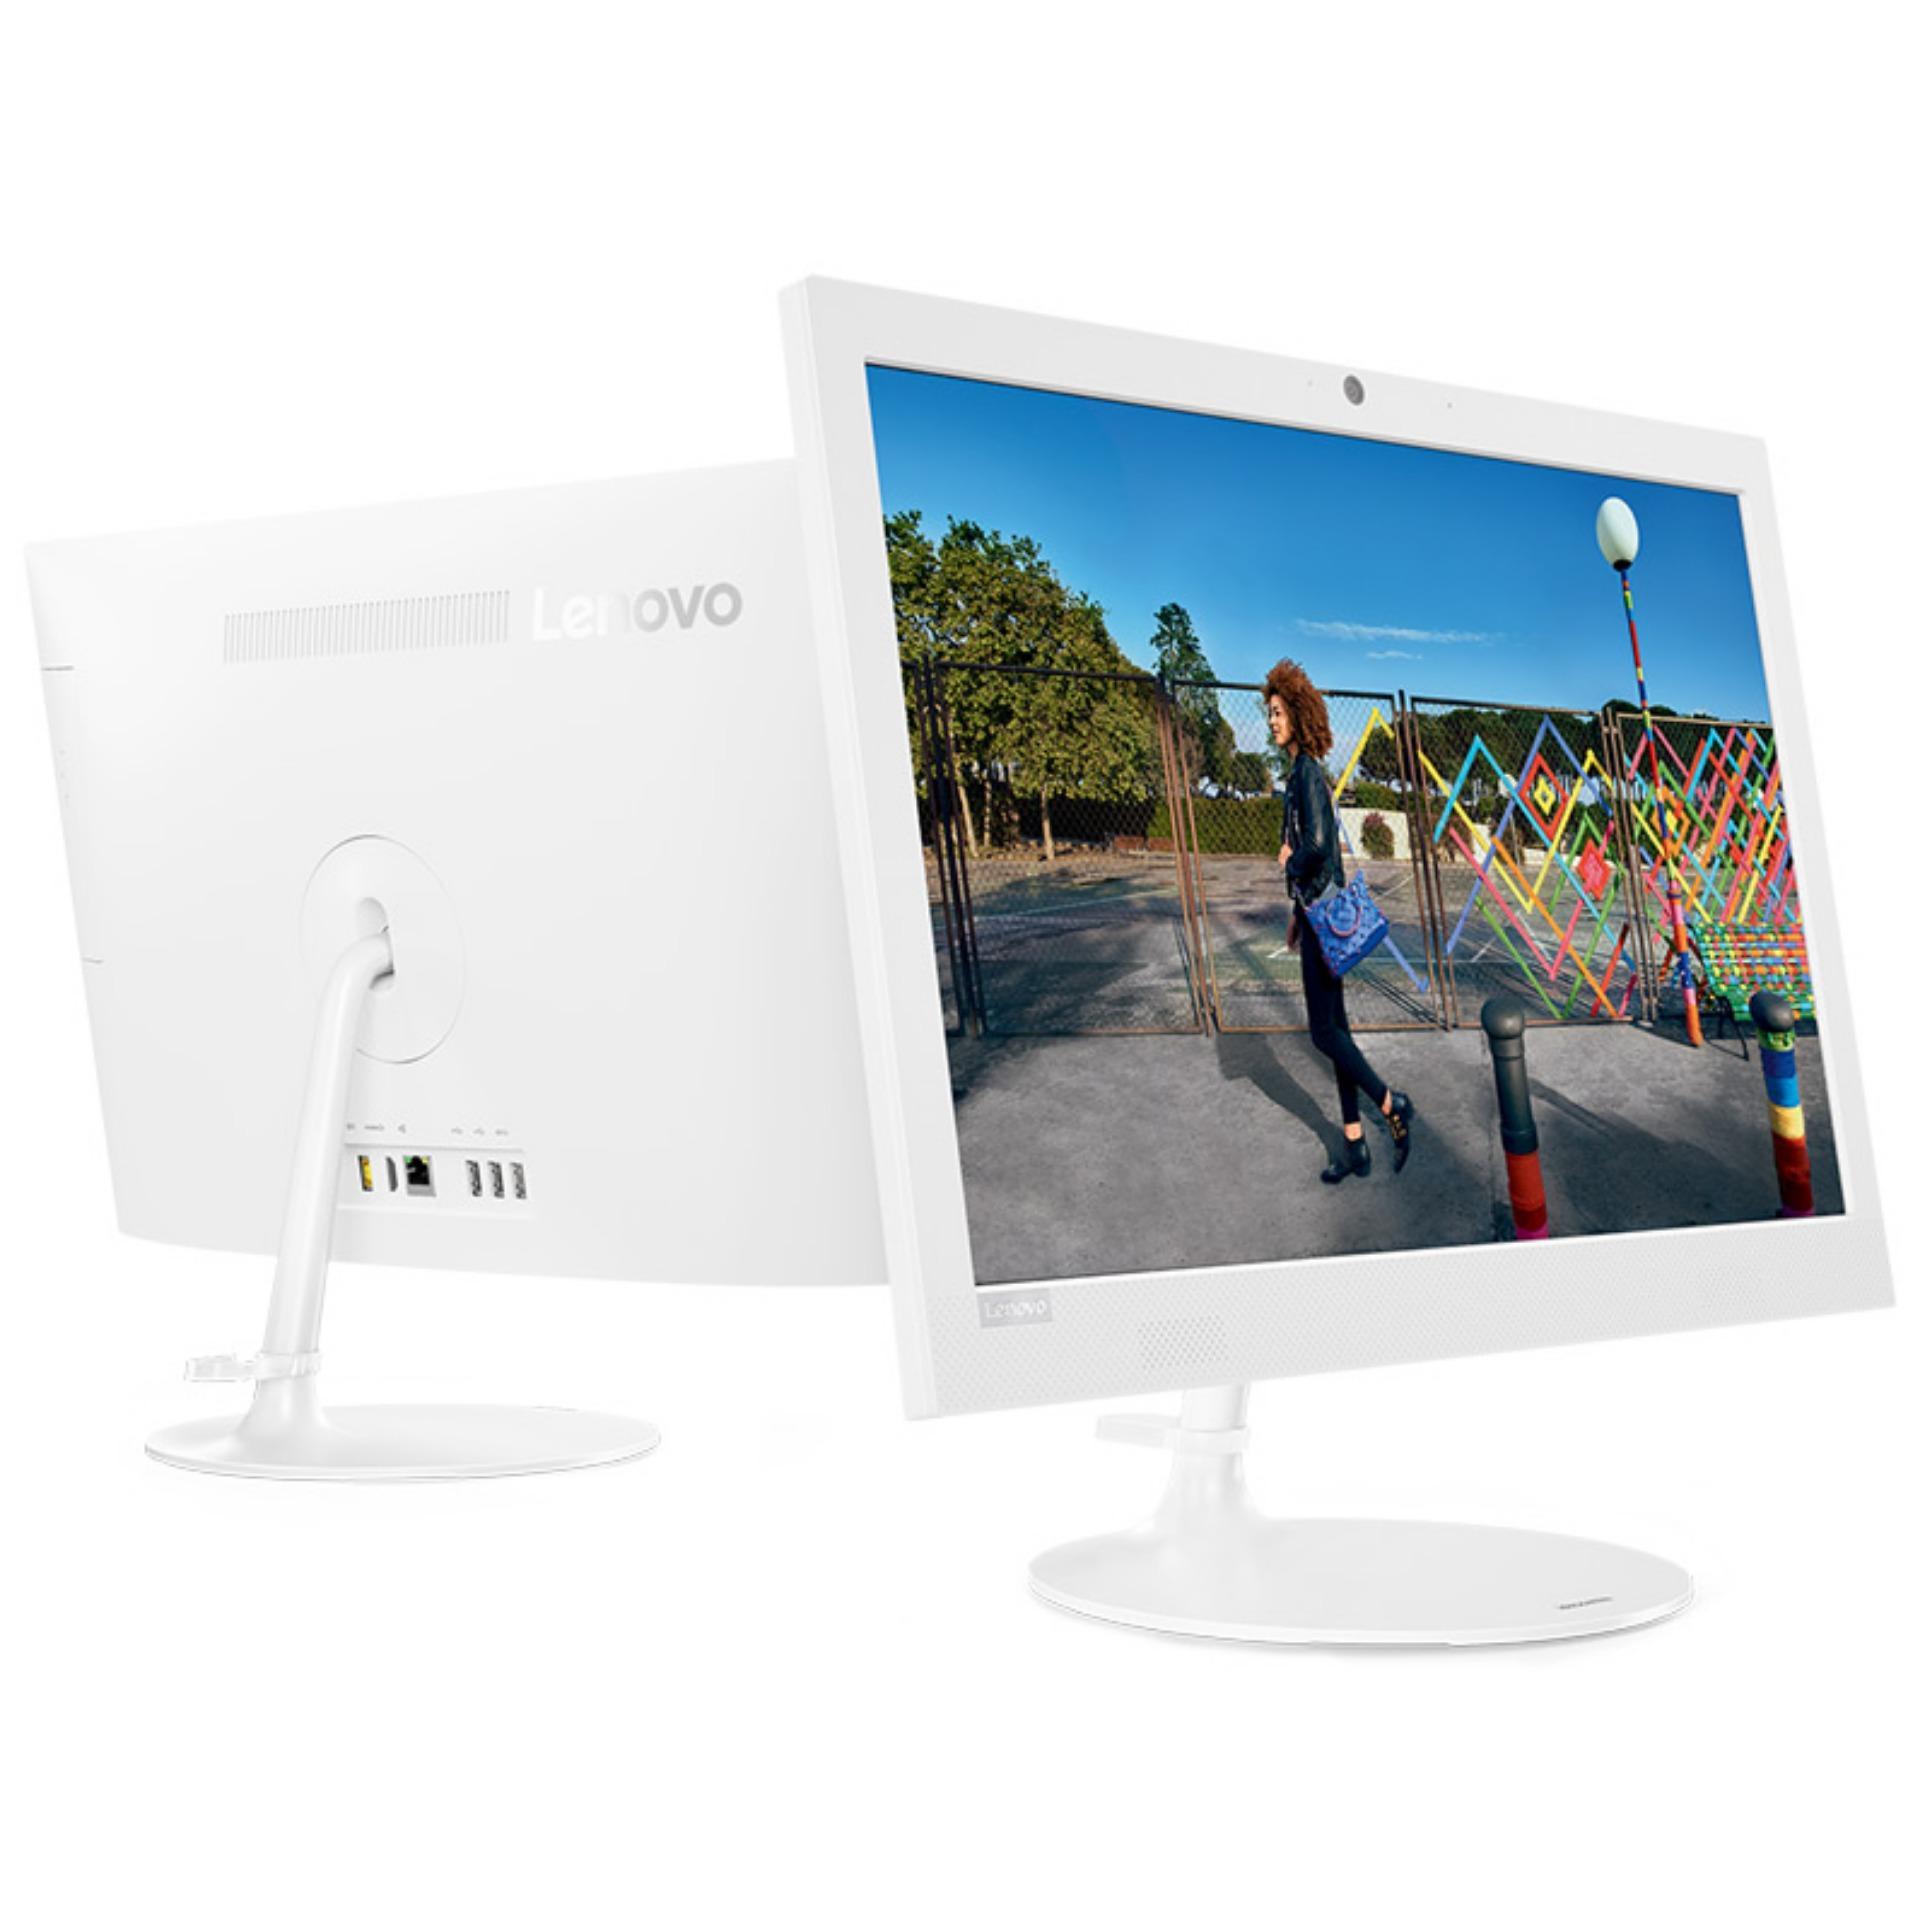 Jual Berbagai Pc All In One Lenovo Terbaik Ideapad 310s 1gid Ideacentre Aio 330 20ast Amd E2 9000 4gb Ddr4